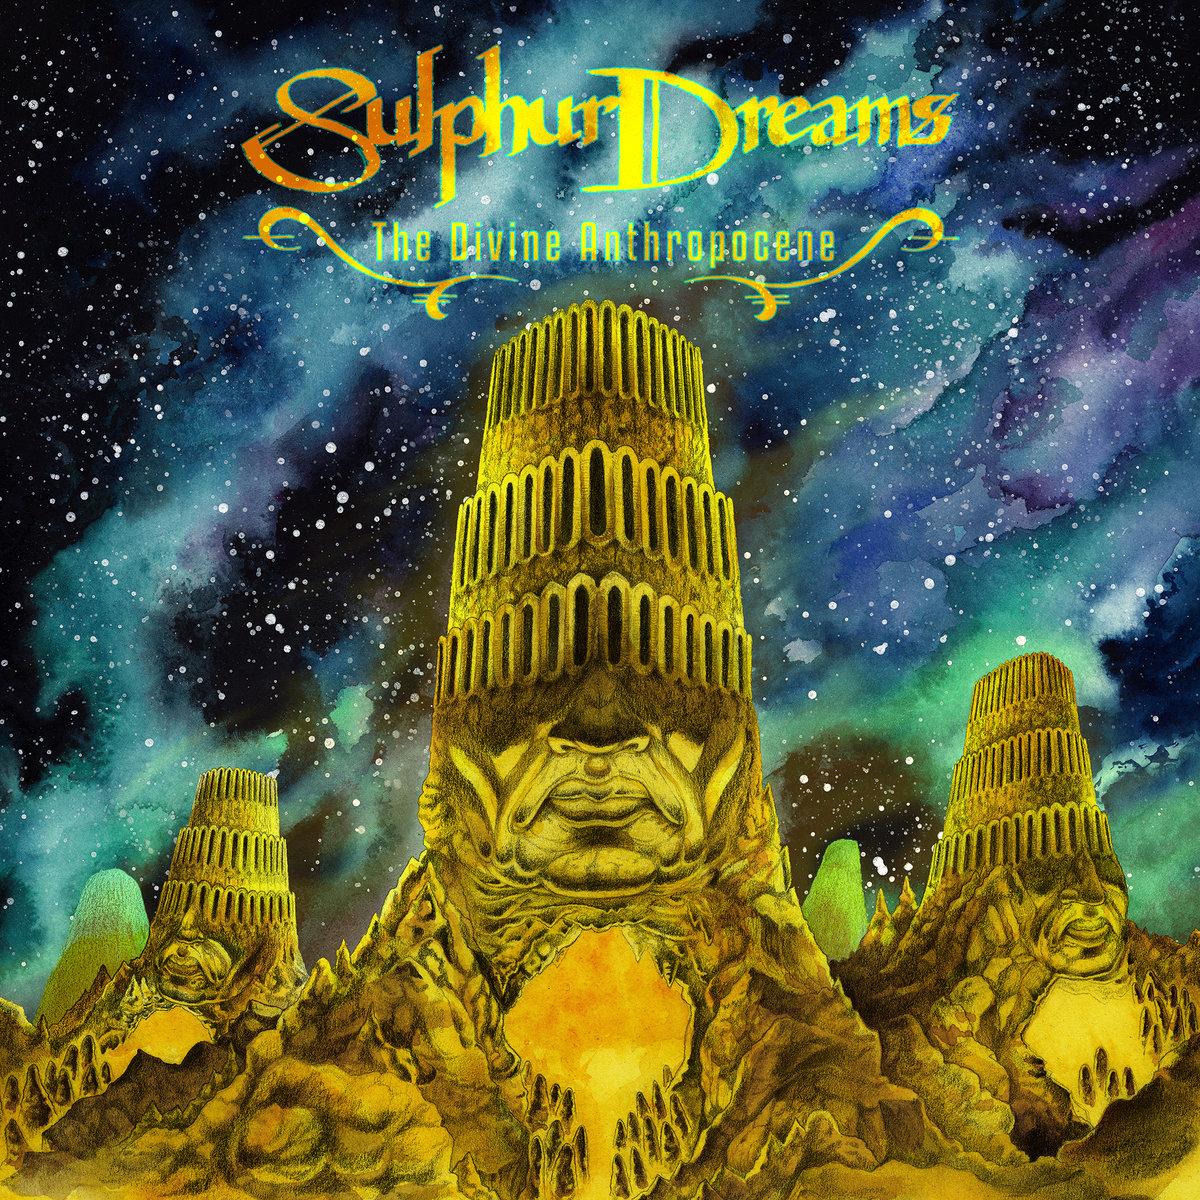 What dreams of sulfur 69